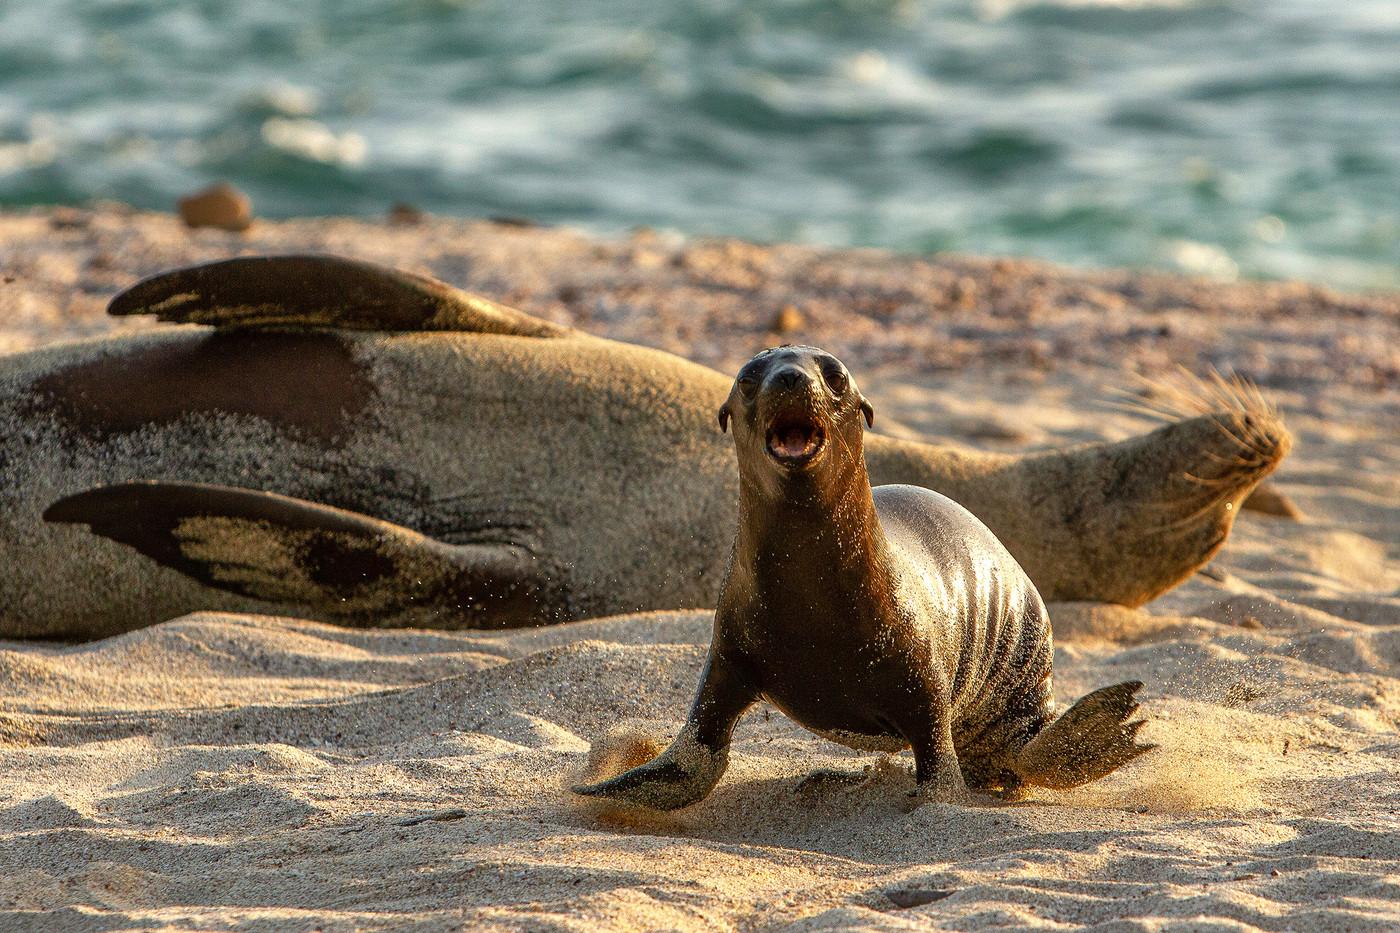 Galapagos Sea Lion pup in the Galapagos Islands, Equador